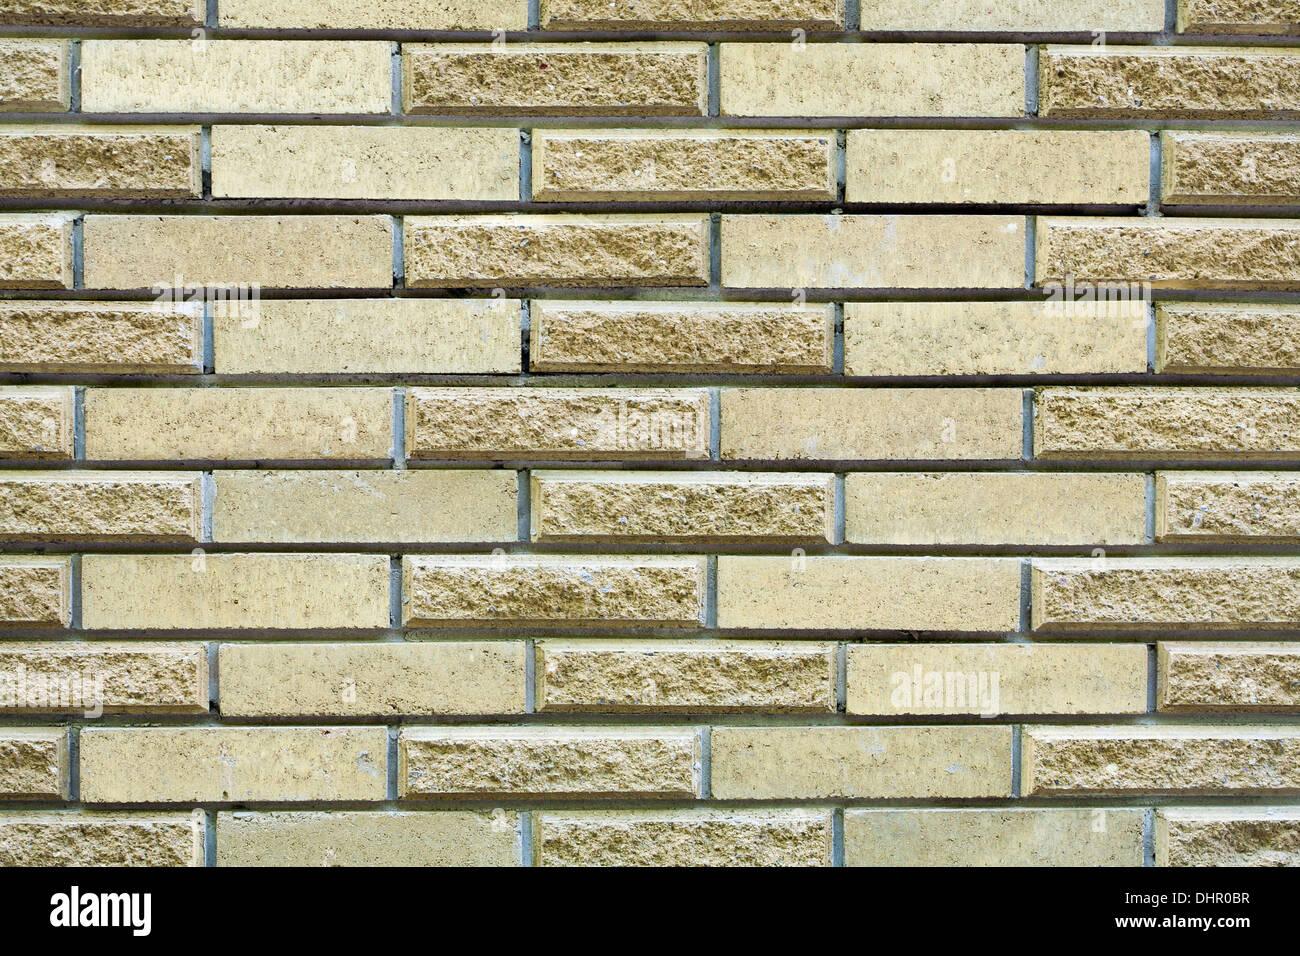 High resolution cream brick wall texture - Stock Image